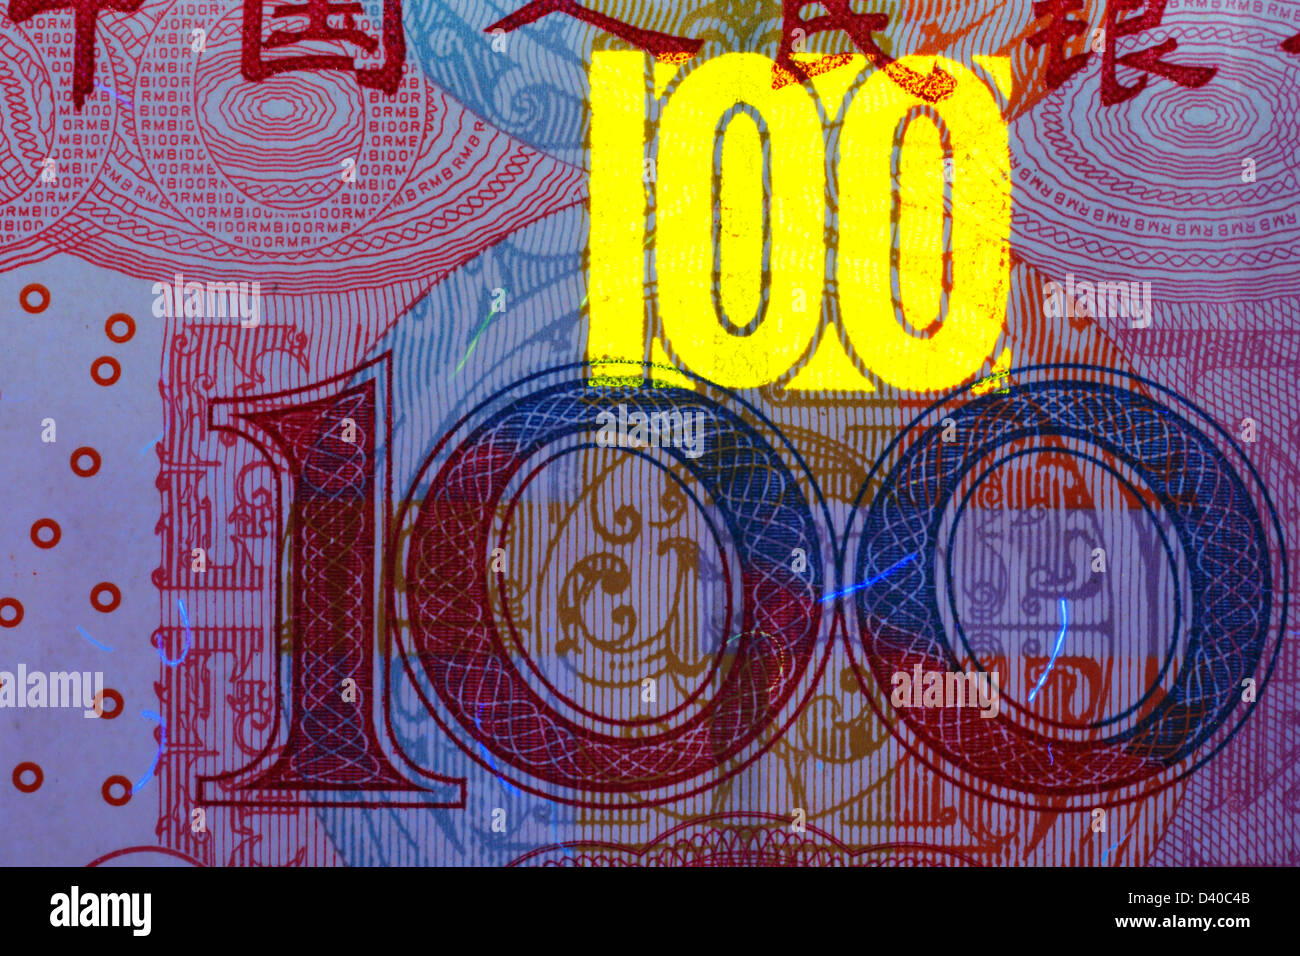 100 Yuan Note Stock Photos   100 Yuan Note Stock Images - Alamy fb3a716aa8b